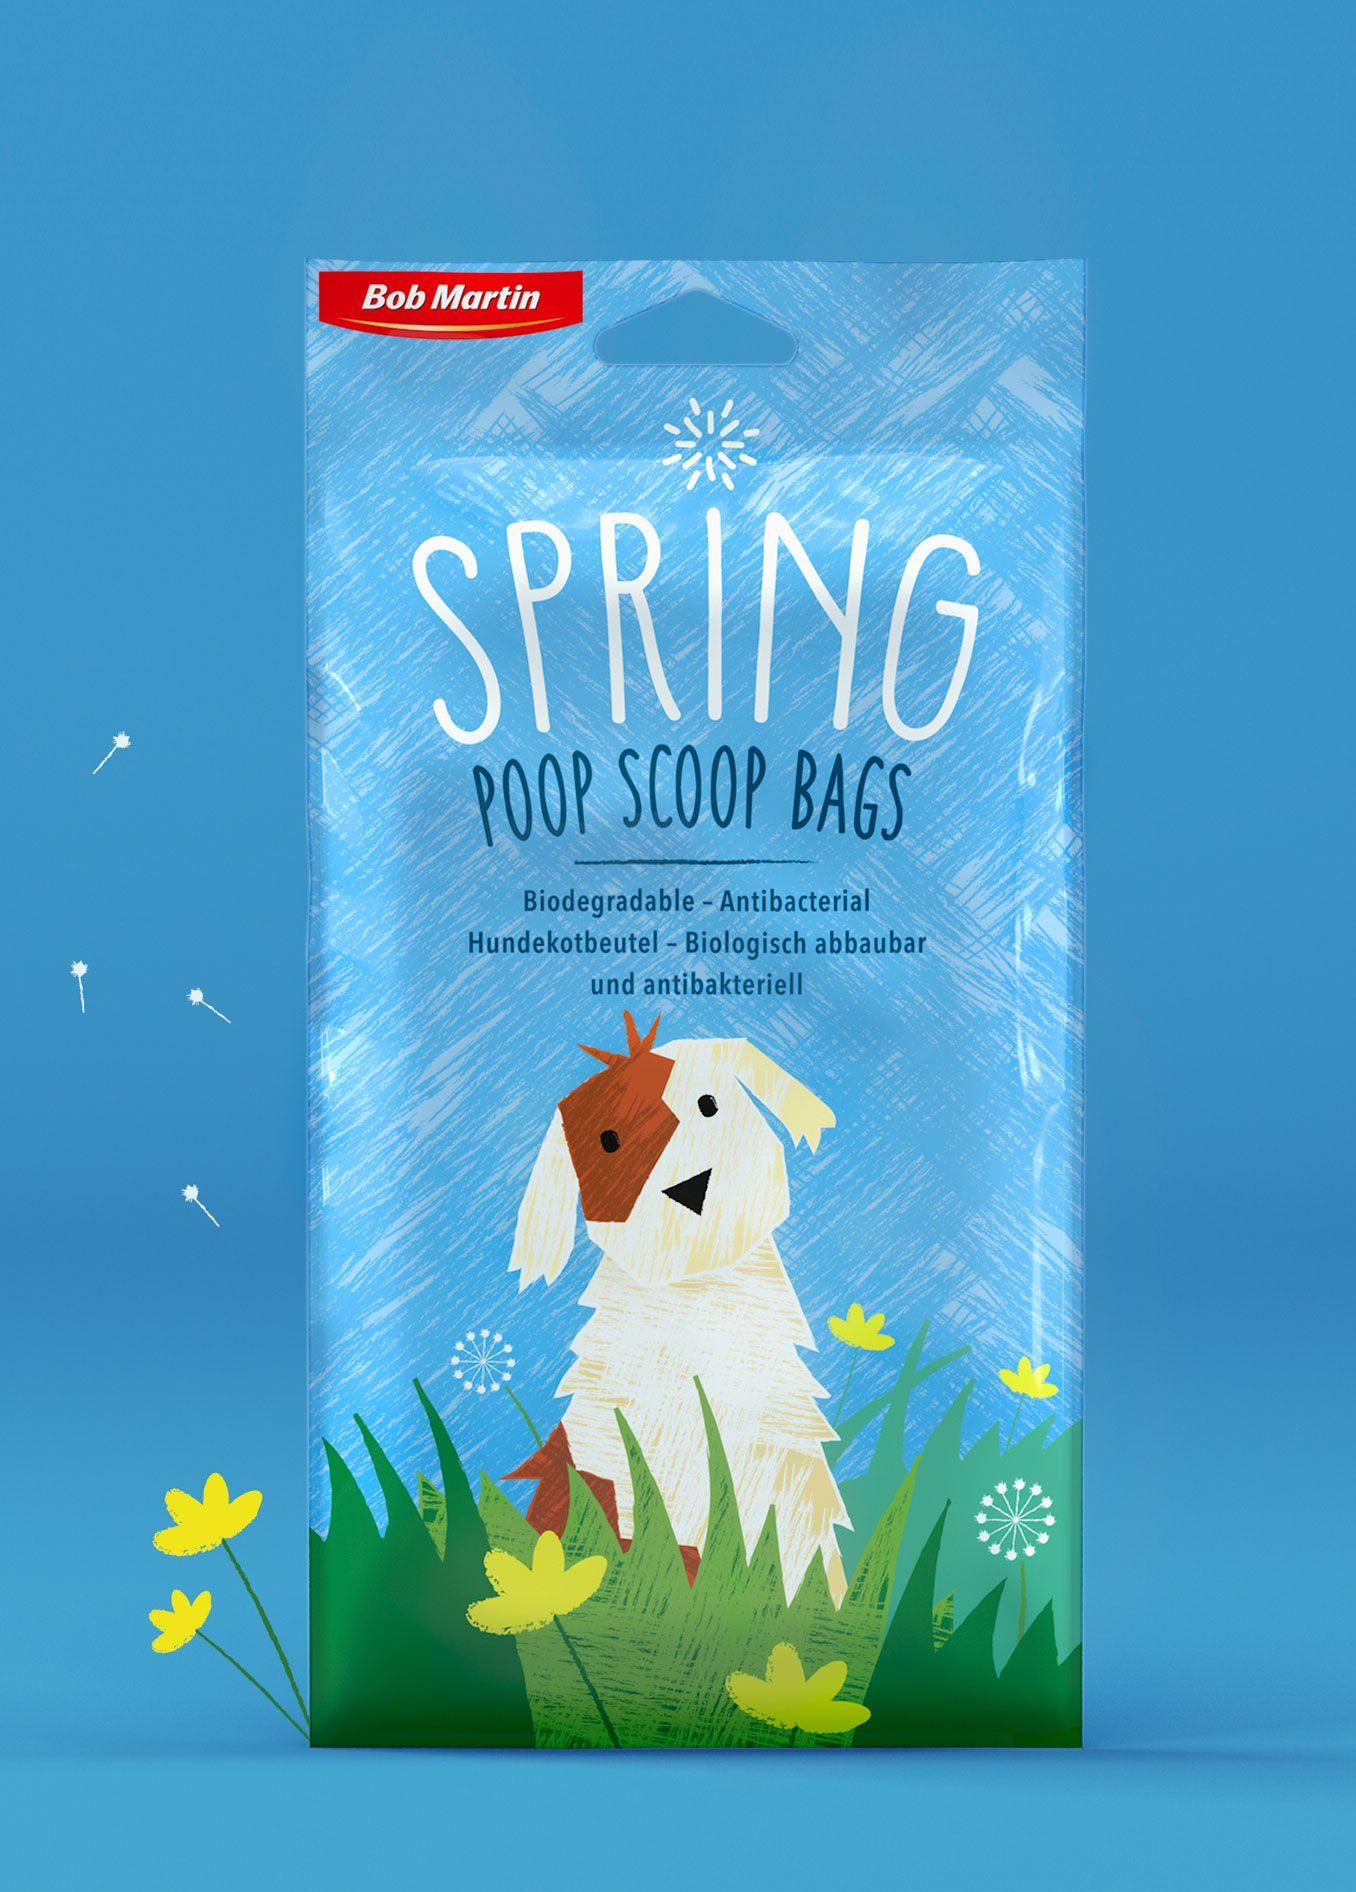 Bob martin midday pet care book cover bob